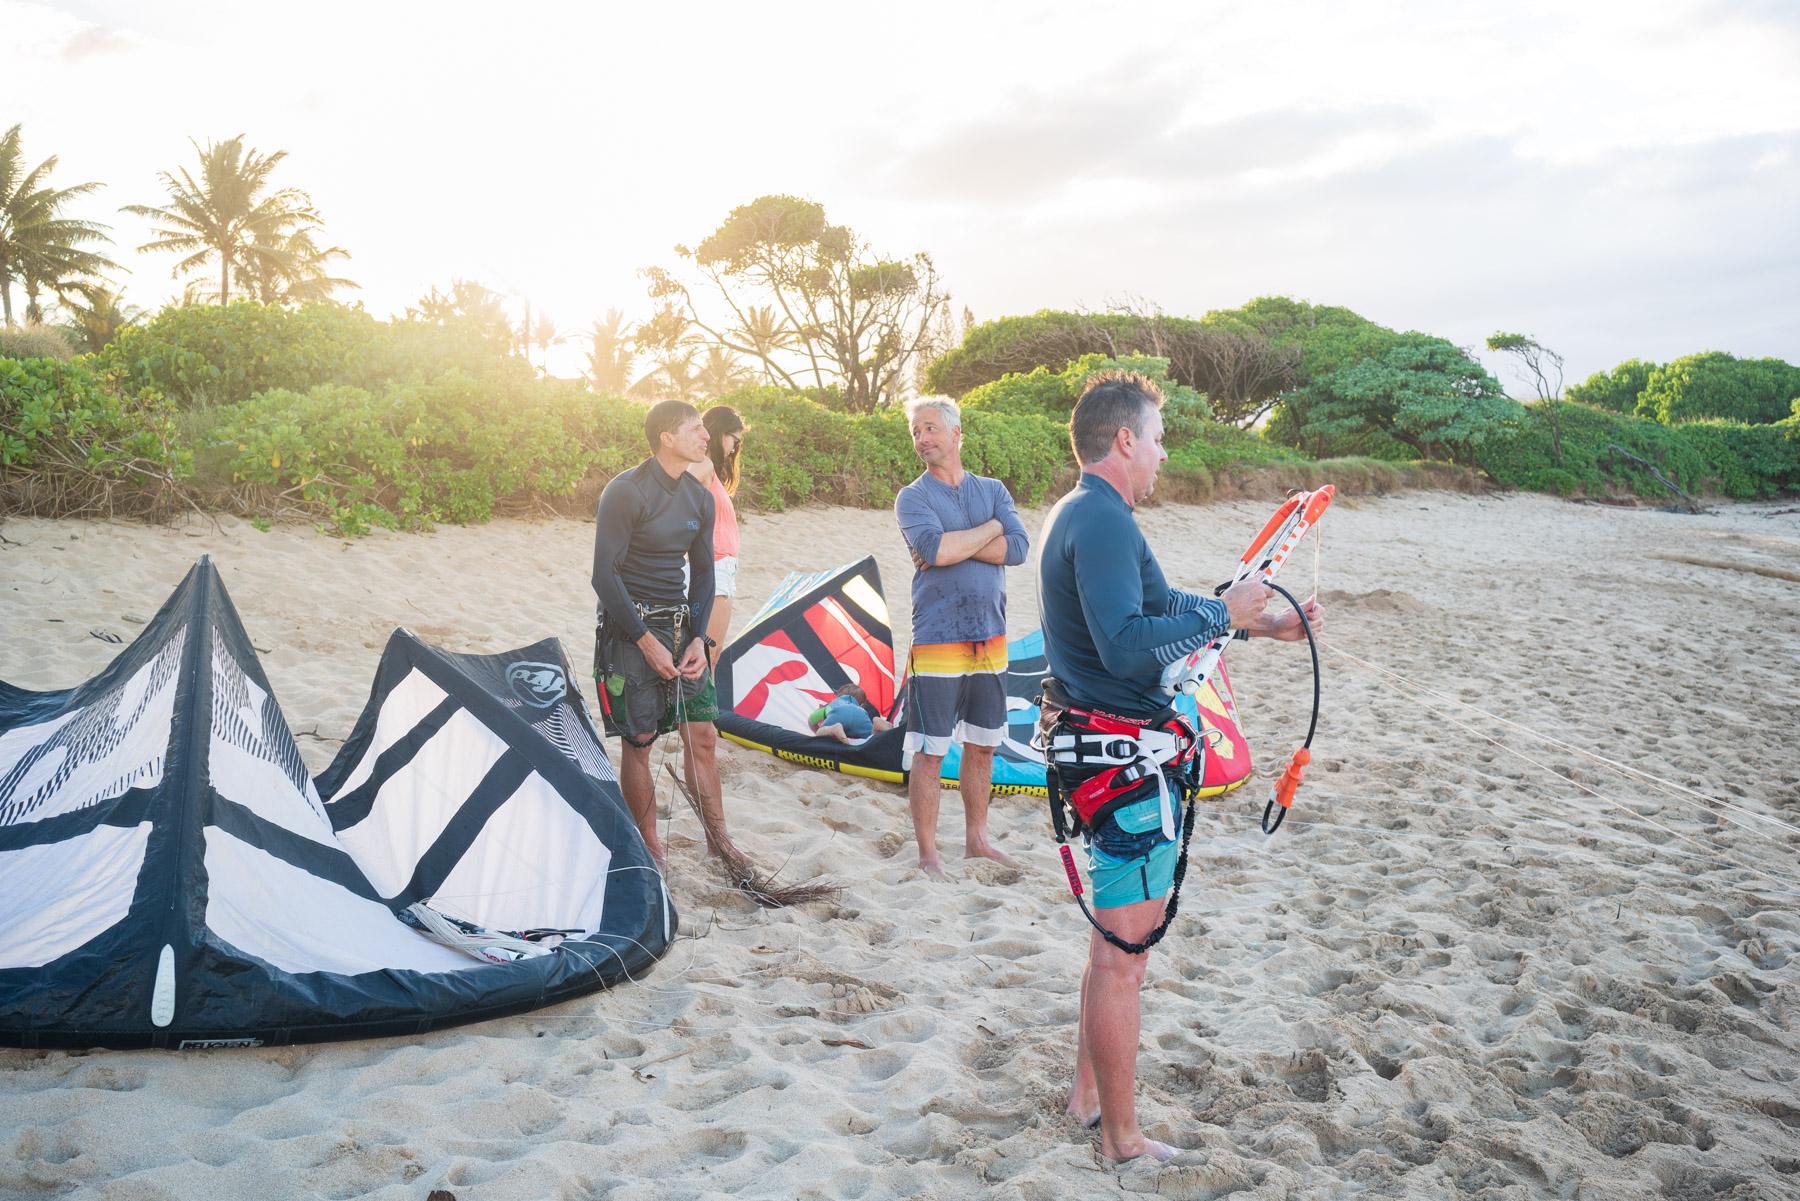 Maui-Trip-Kite-45.jpg